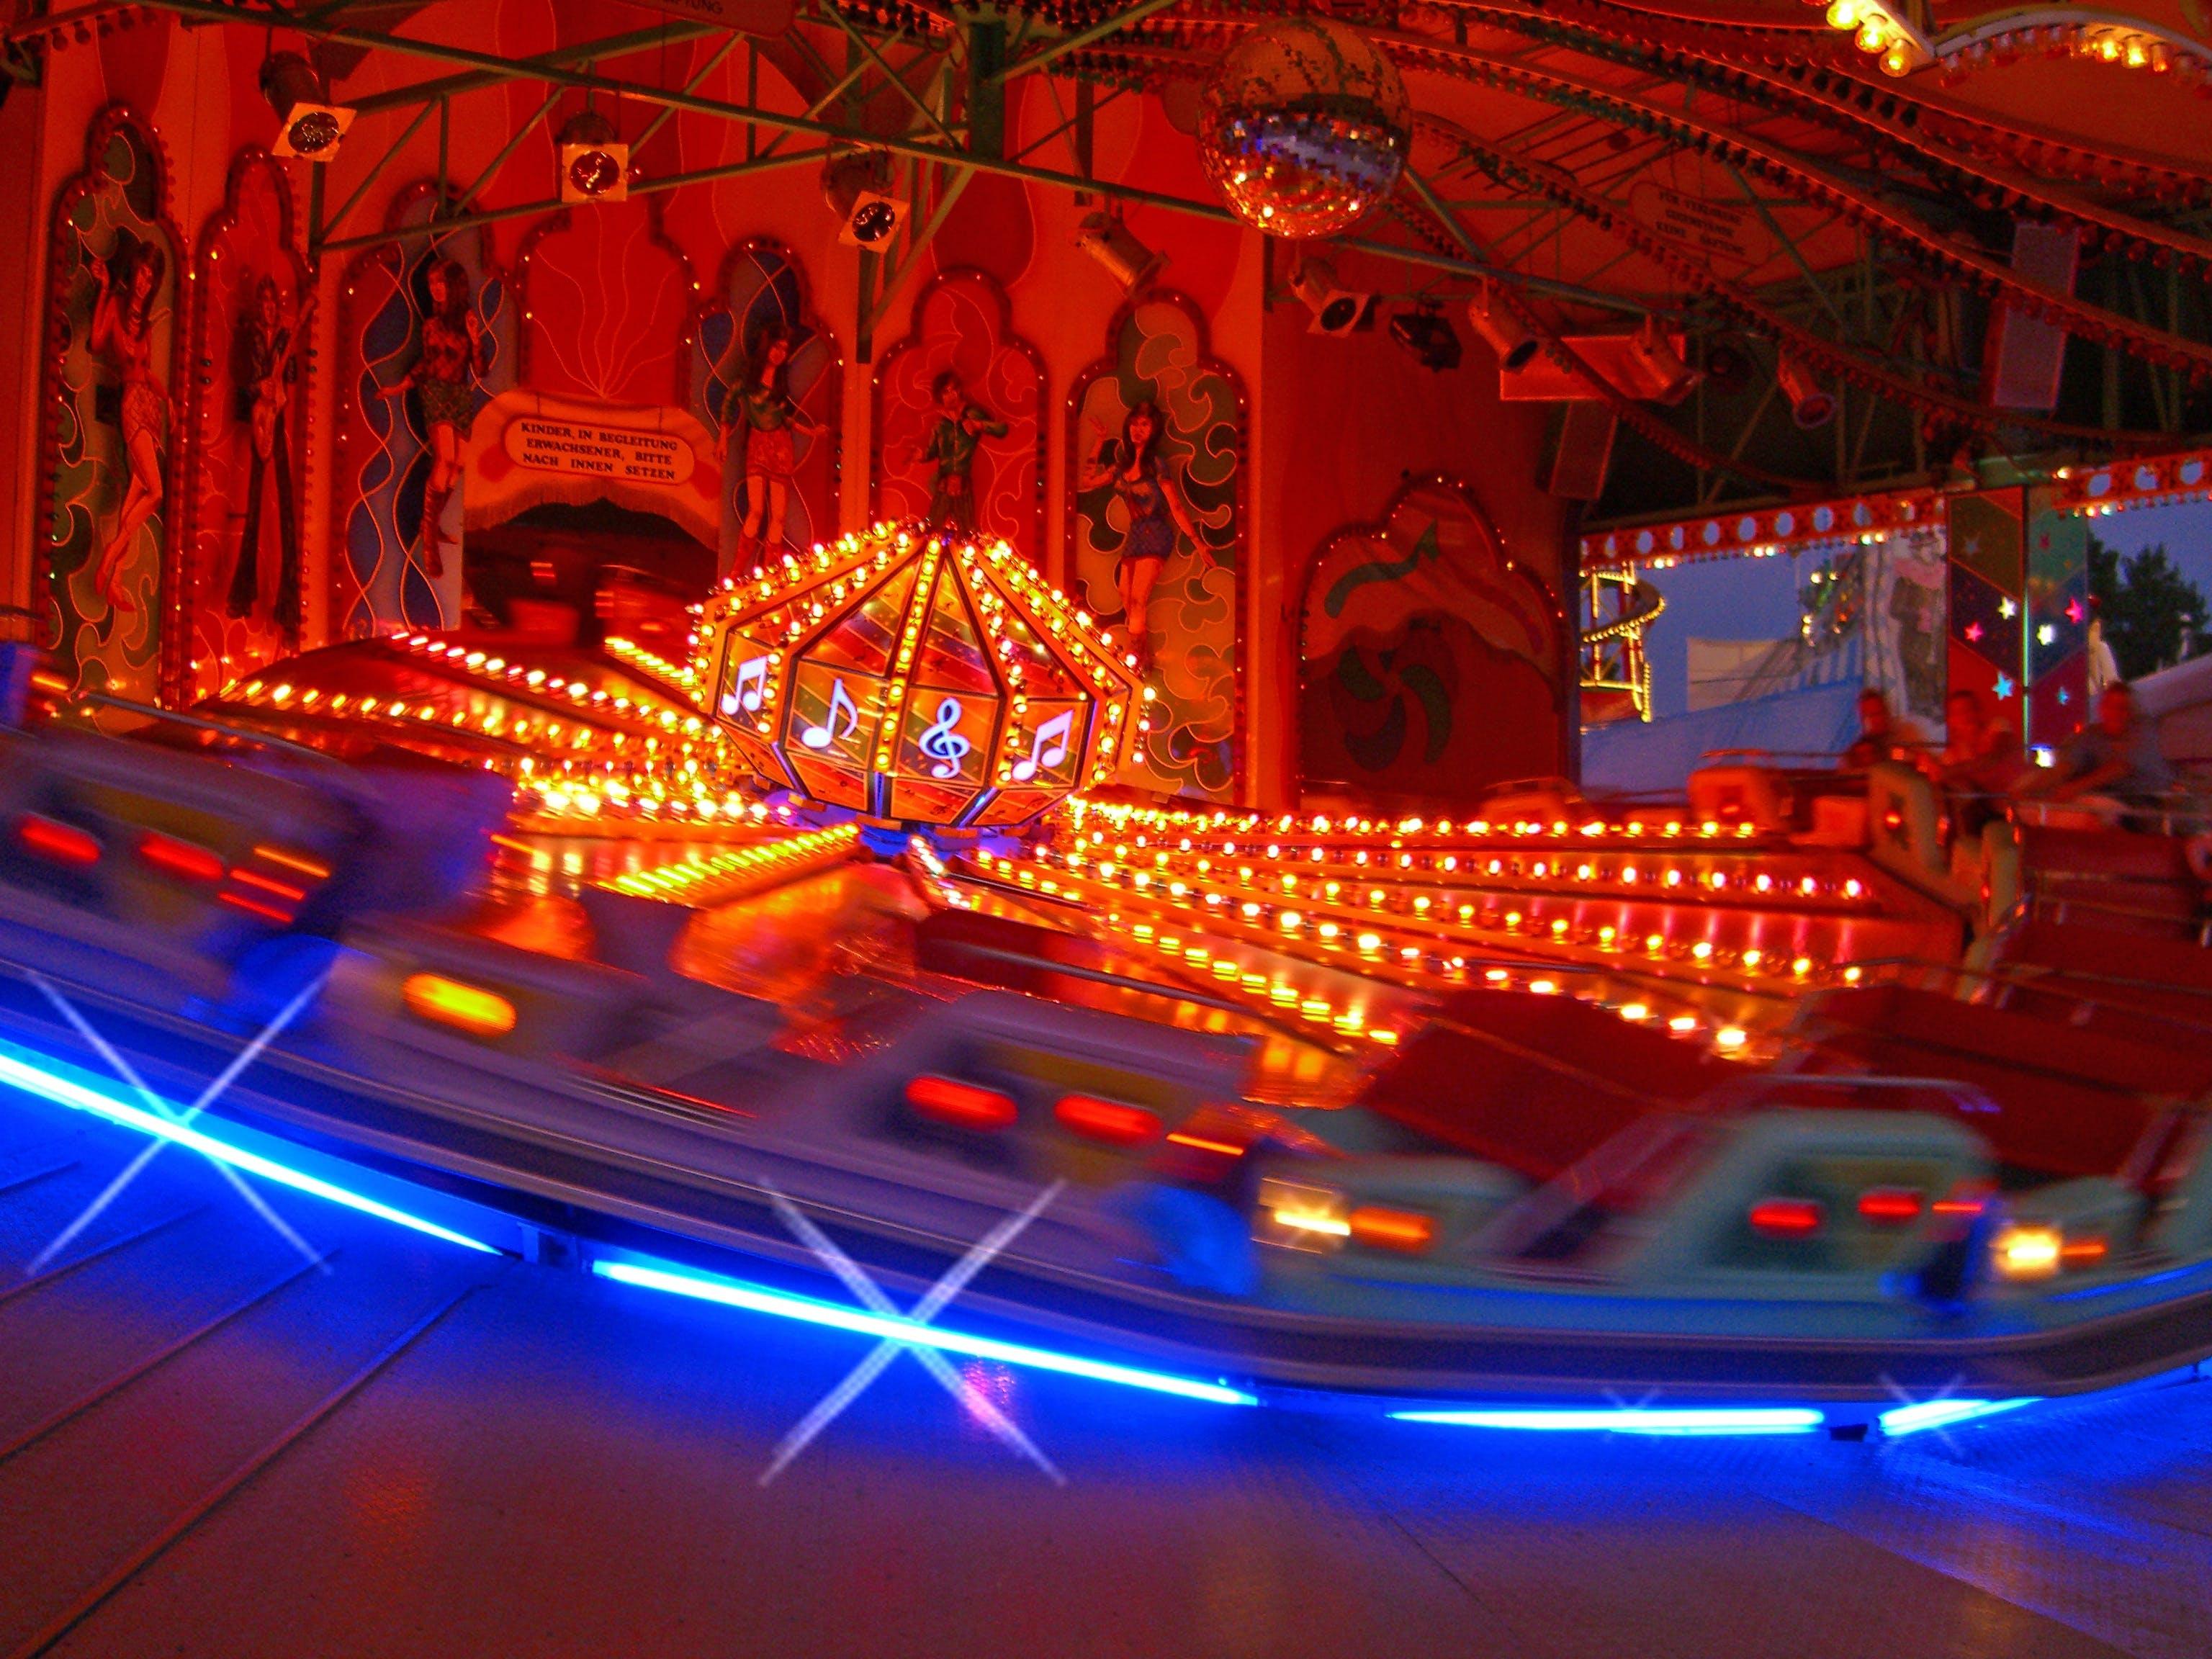 Gratis stockfoto met beweging, carnaval, carrousel, discobal